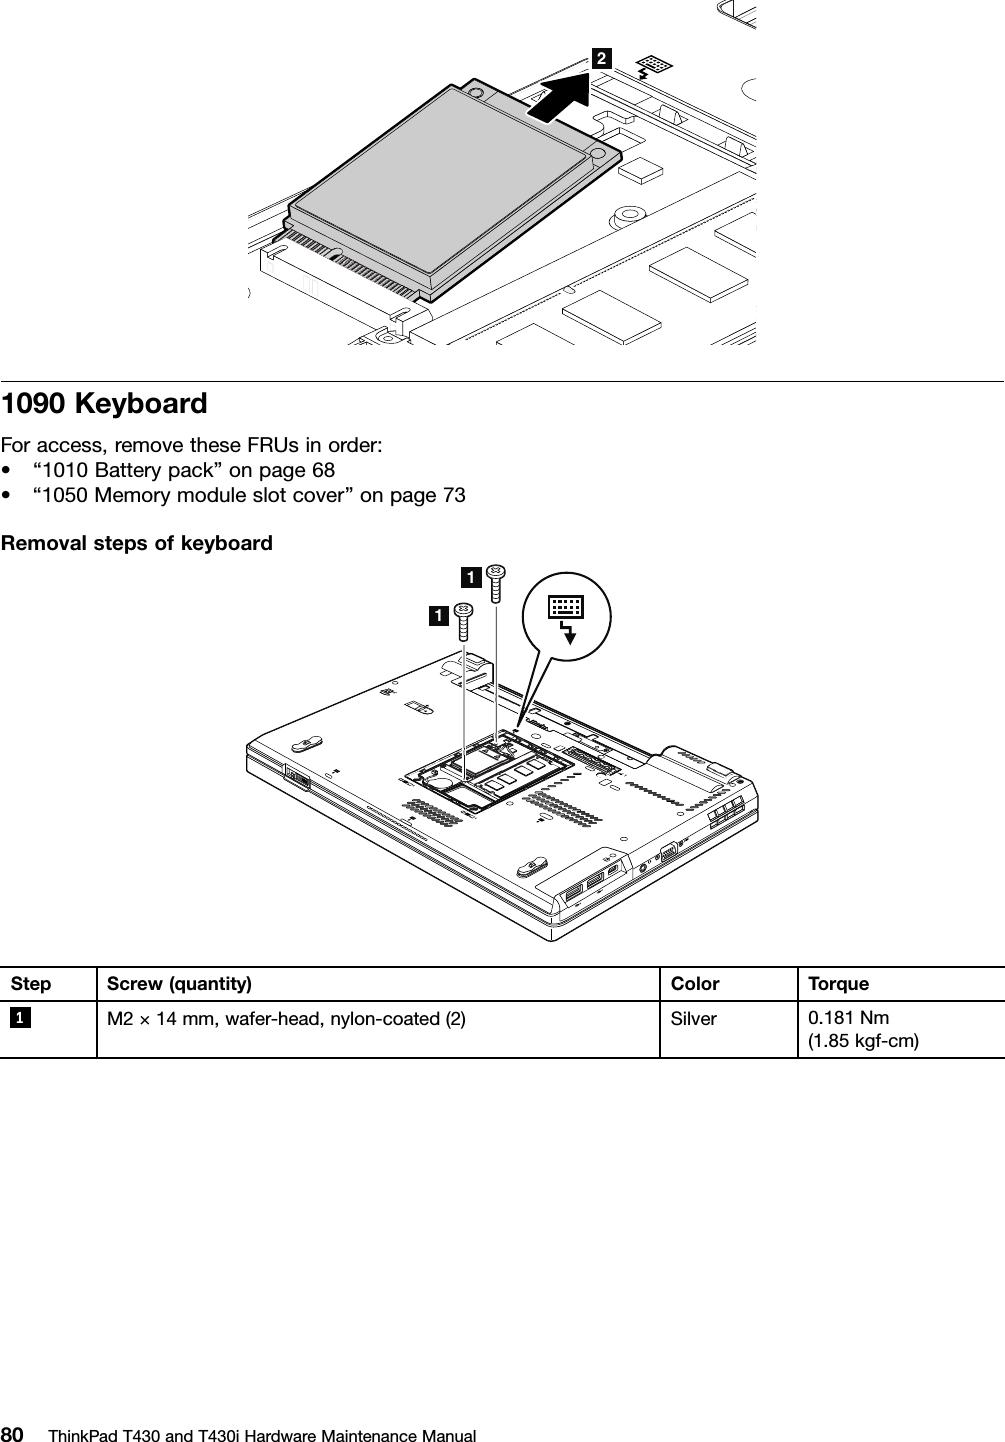 Lenovo T430 T430I Hmm En 0B48304 04 User Manual Hardware